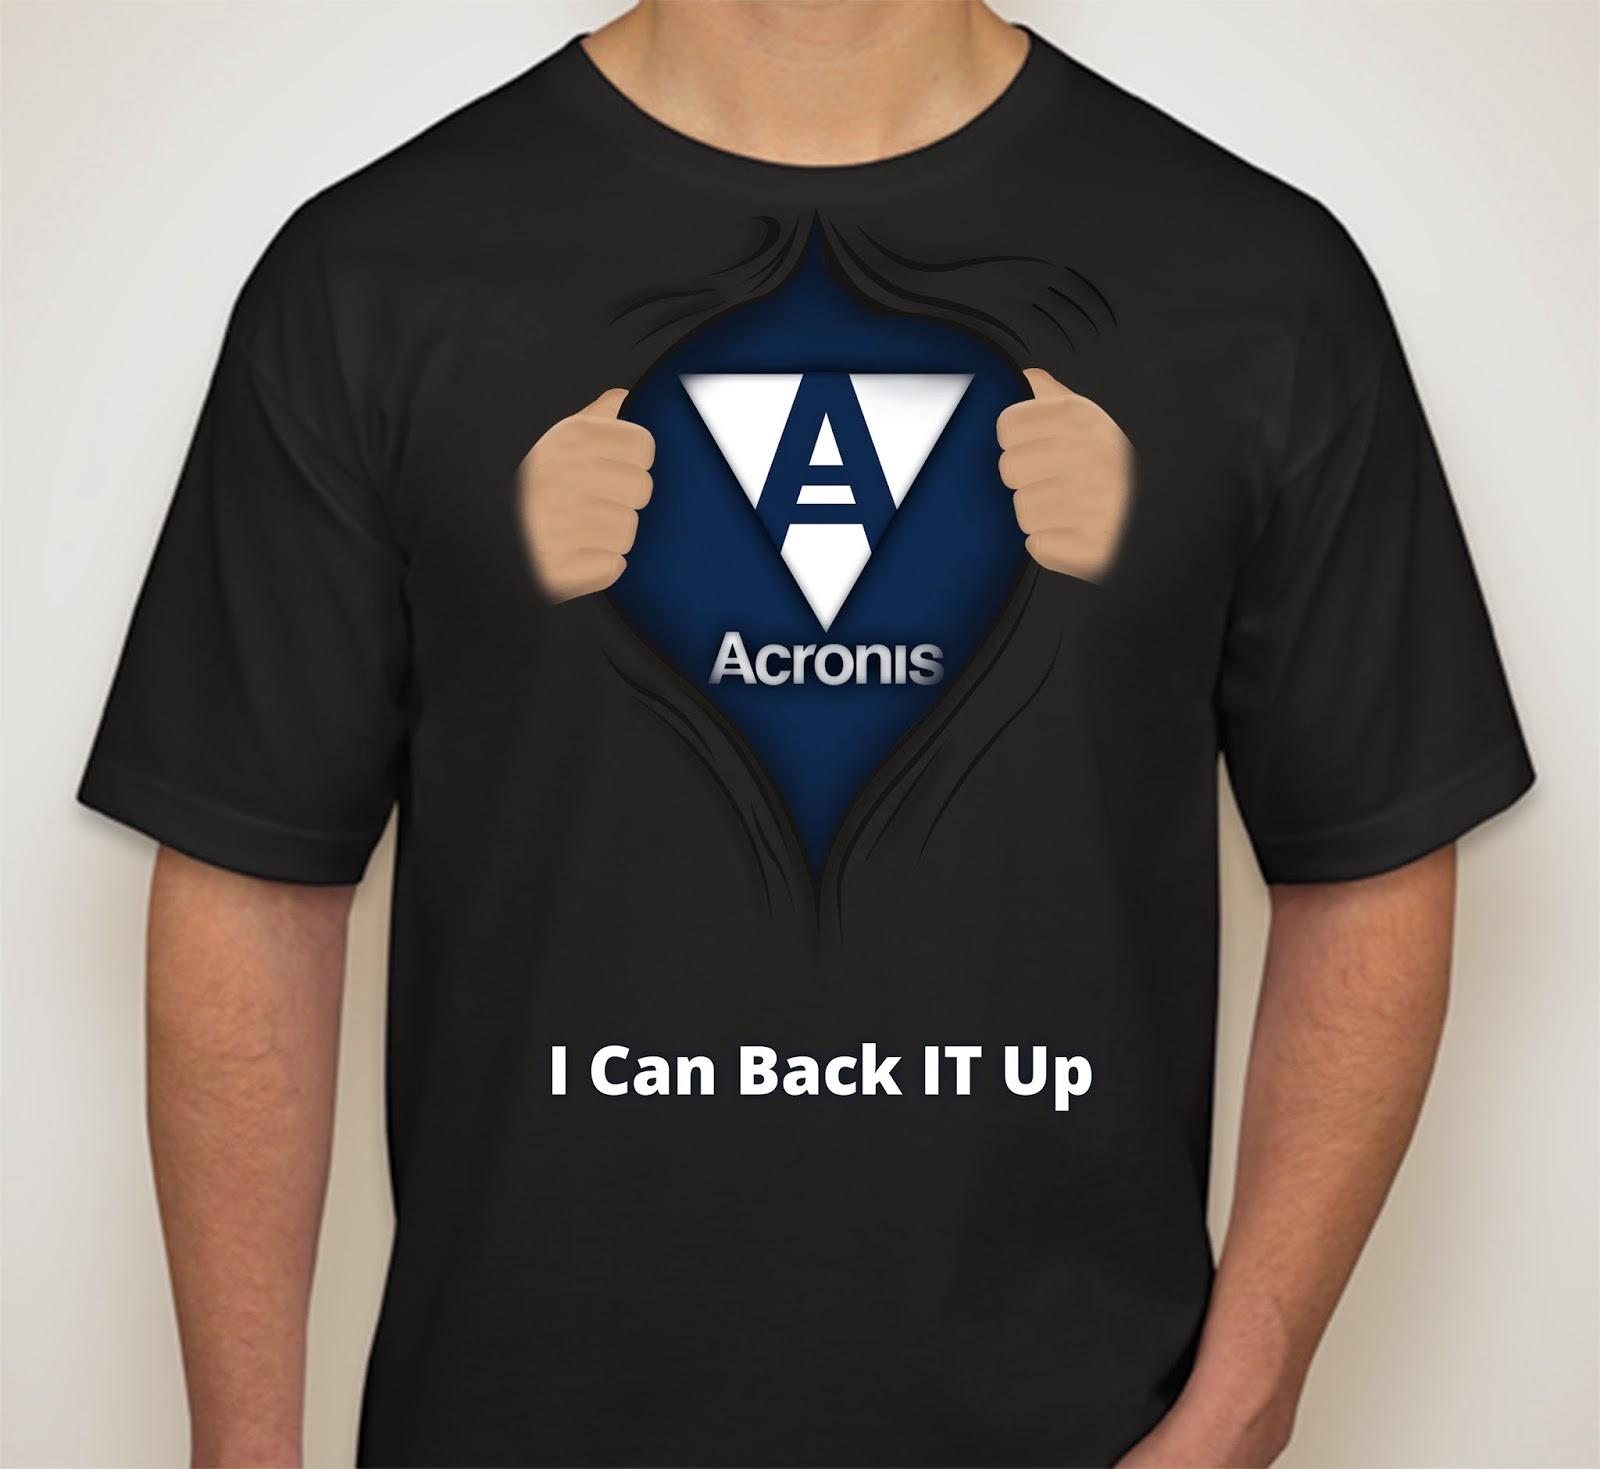 Shirt rip design - T Shirt Design